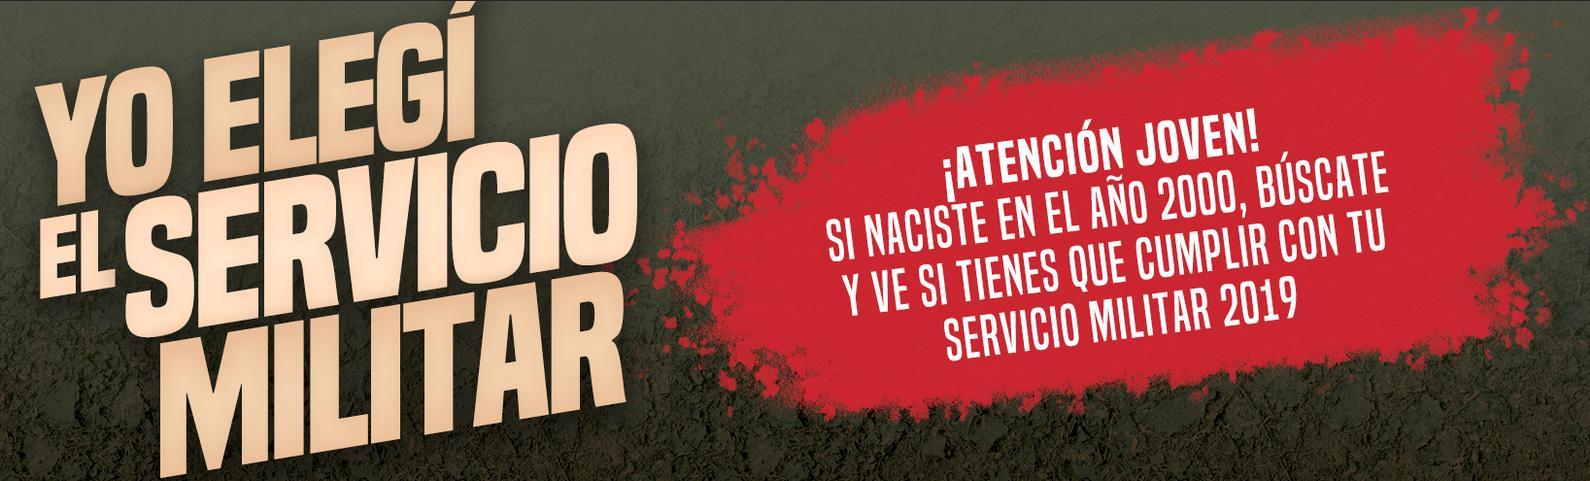 www.serviciomilitar.cl